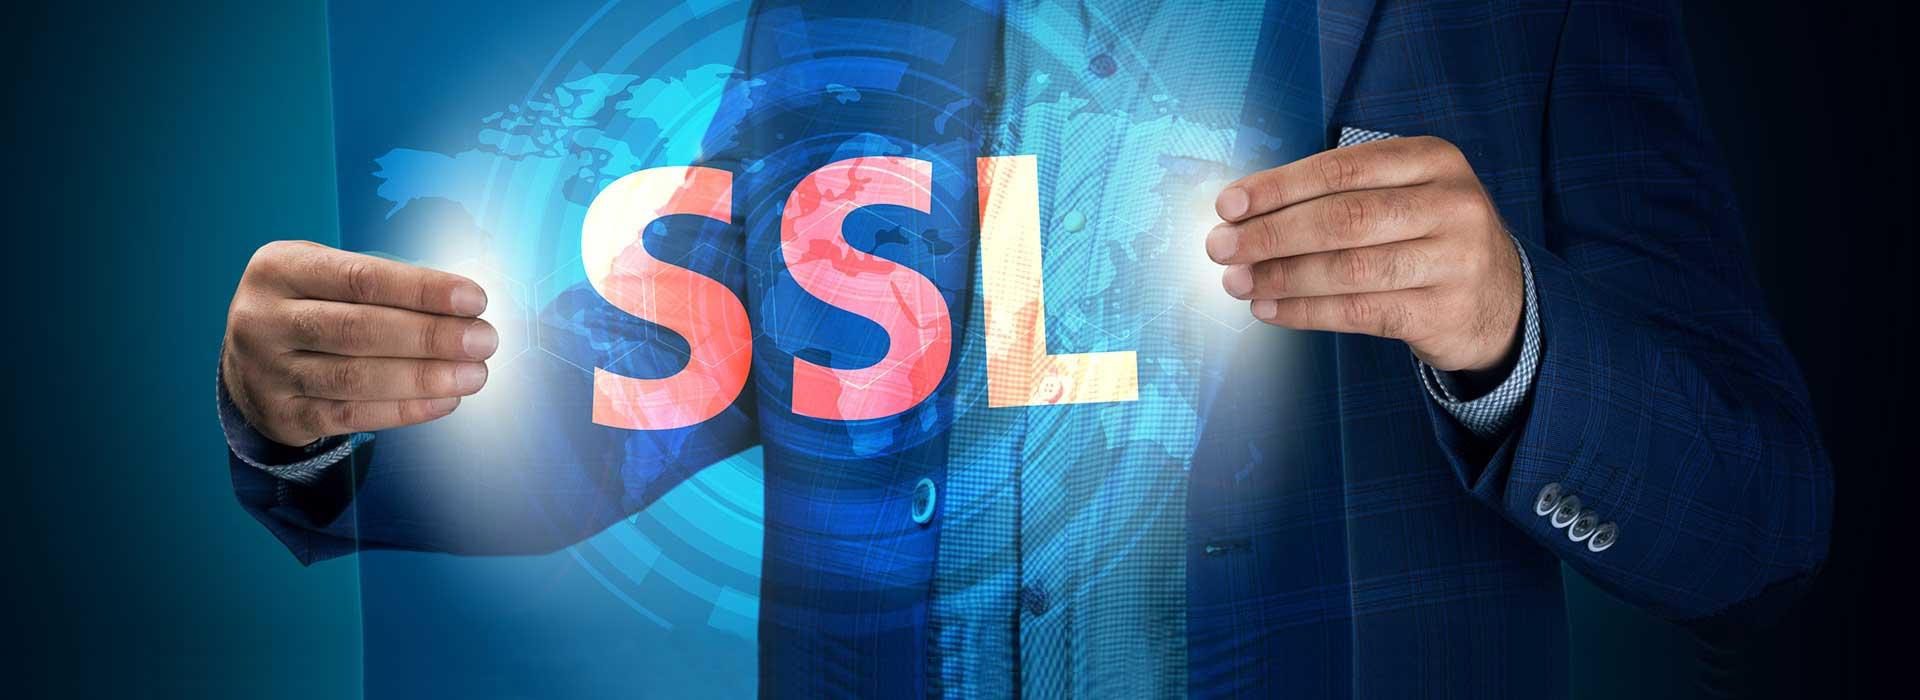 <small>Qu'est-ce que le protocole SSL / TLS ?</small>